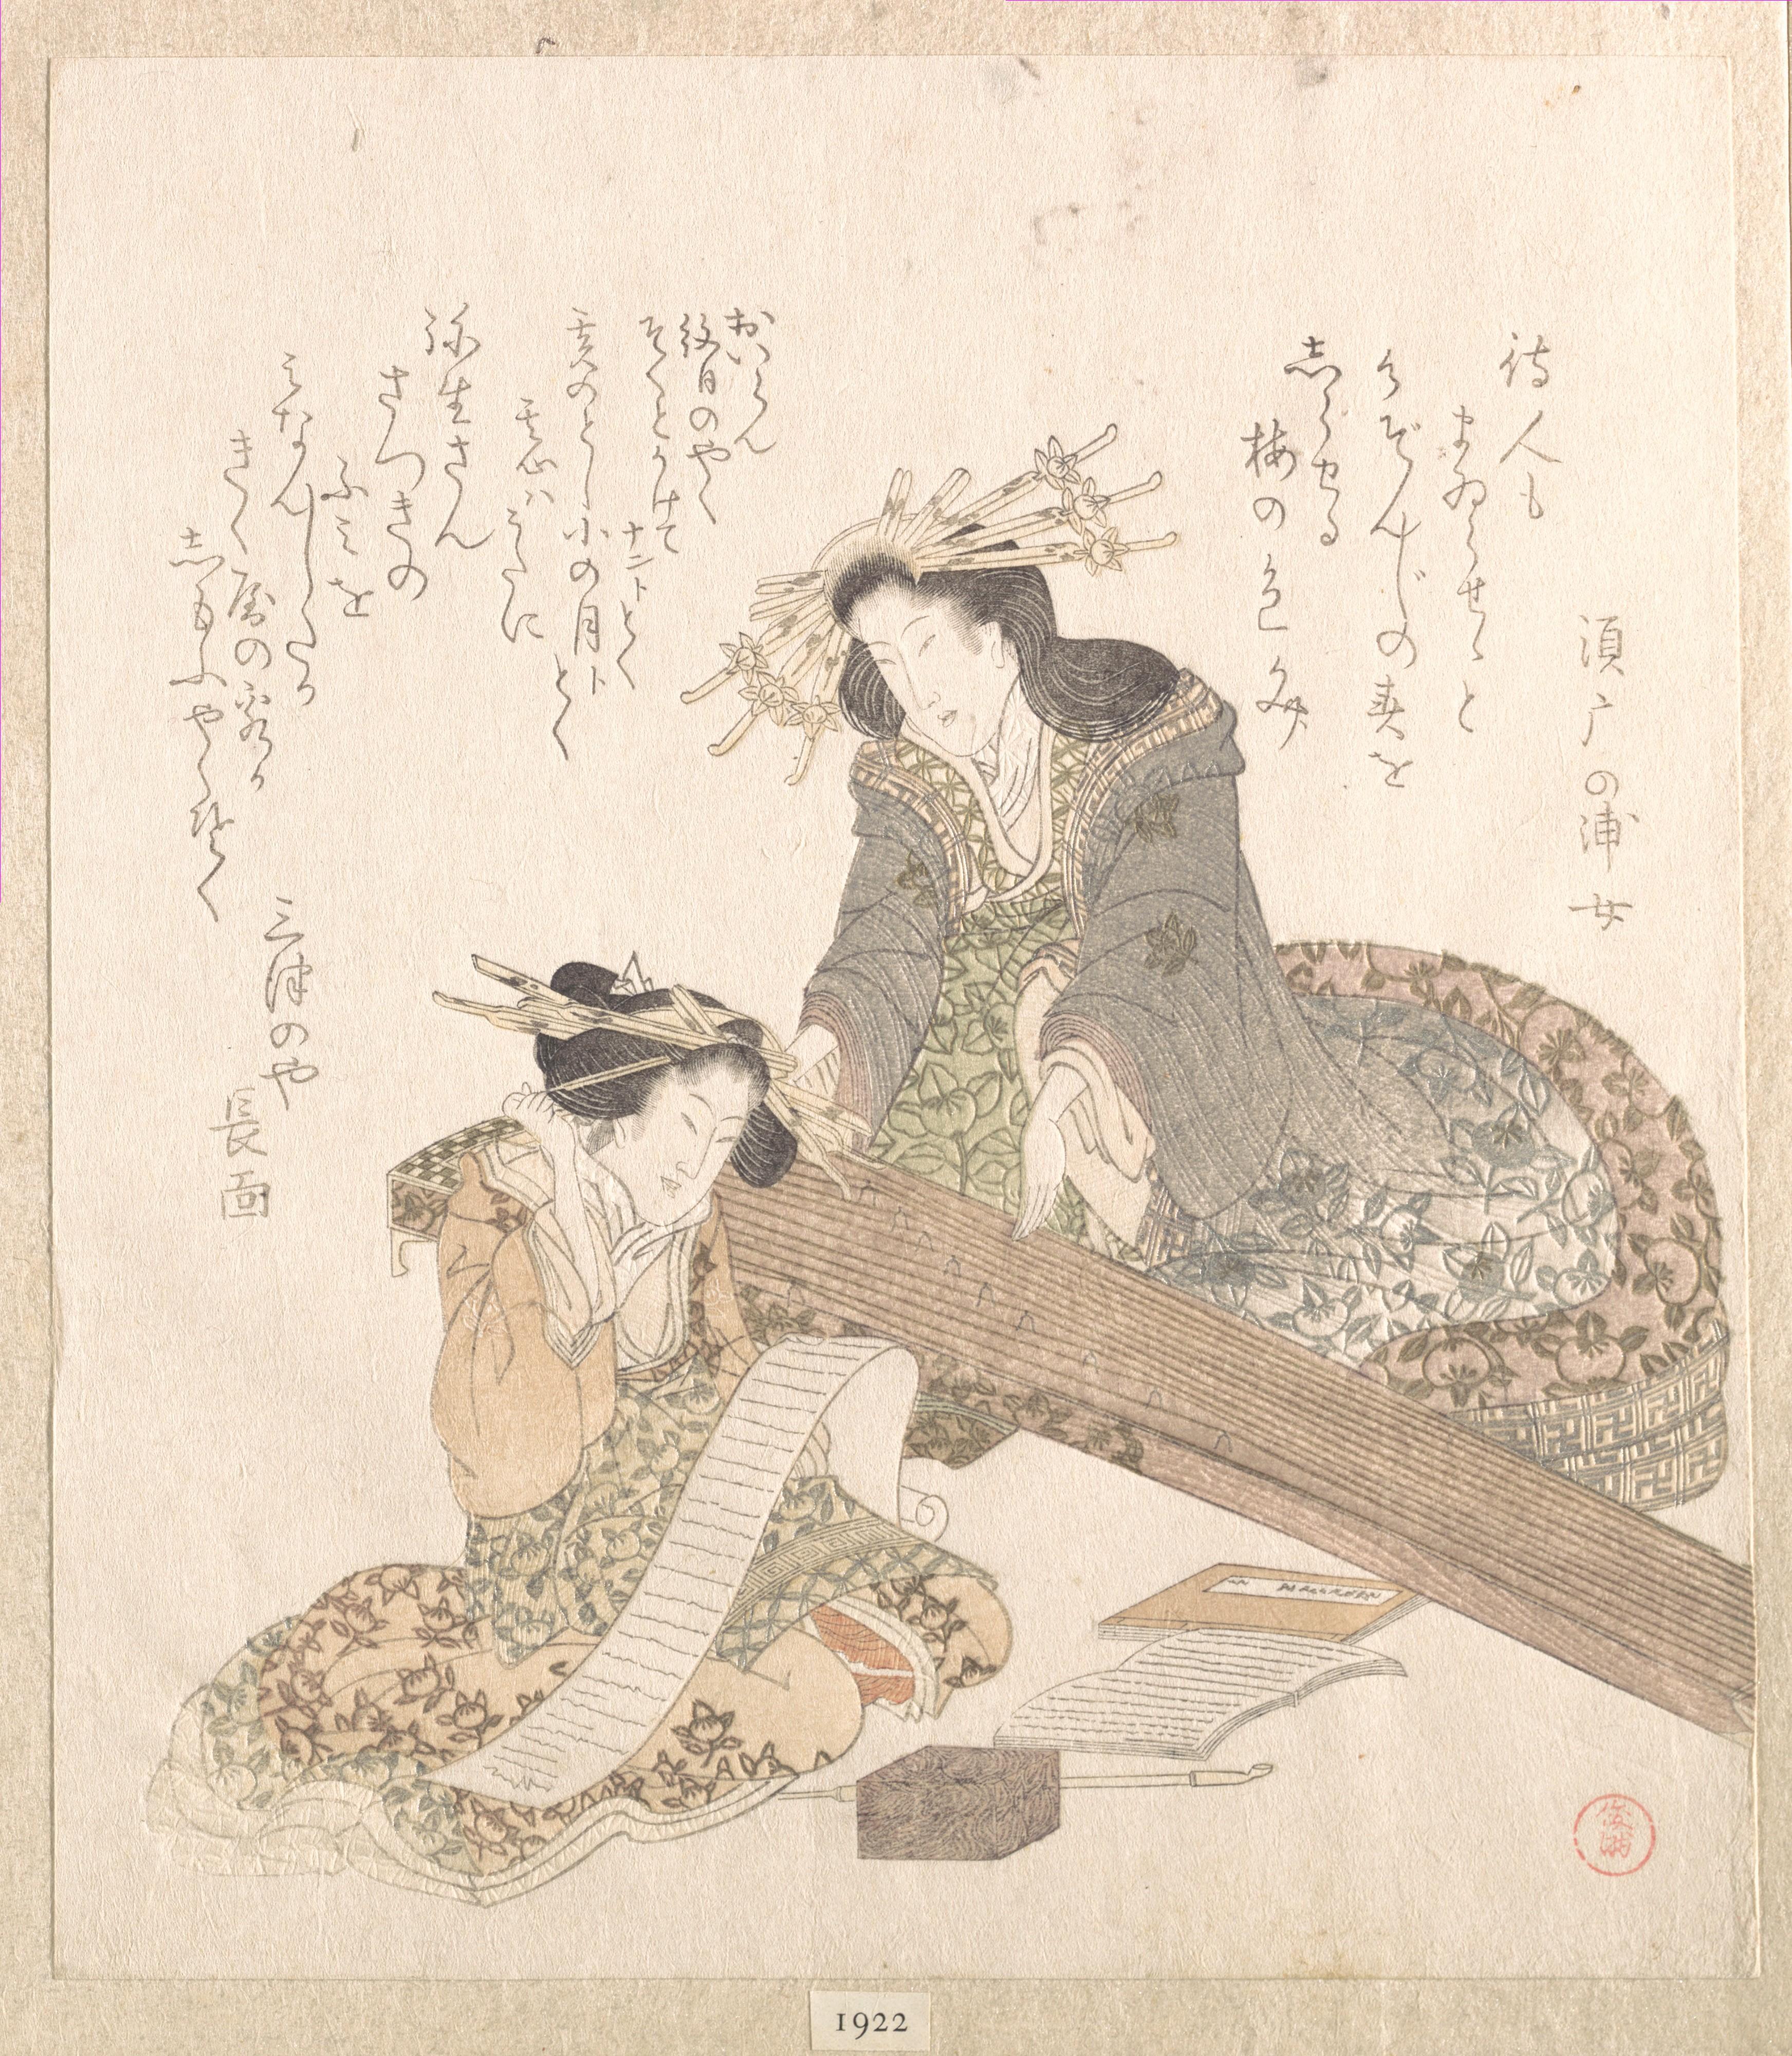 Куртизанка, играющая на кото и куртизанка, читающая письмо_206х183 мм